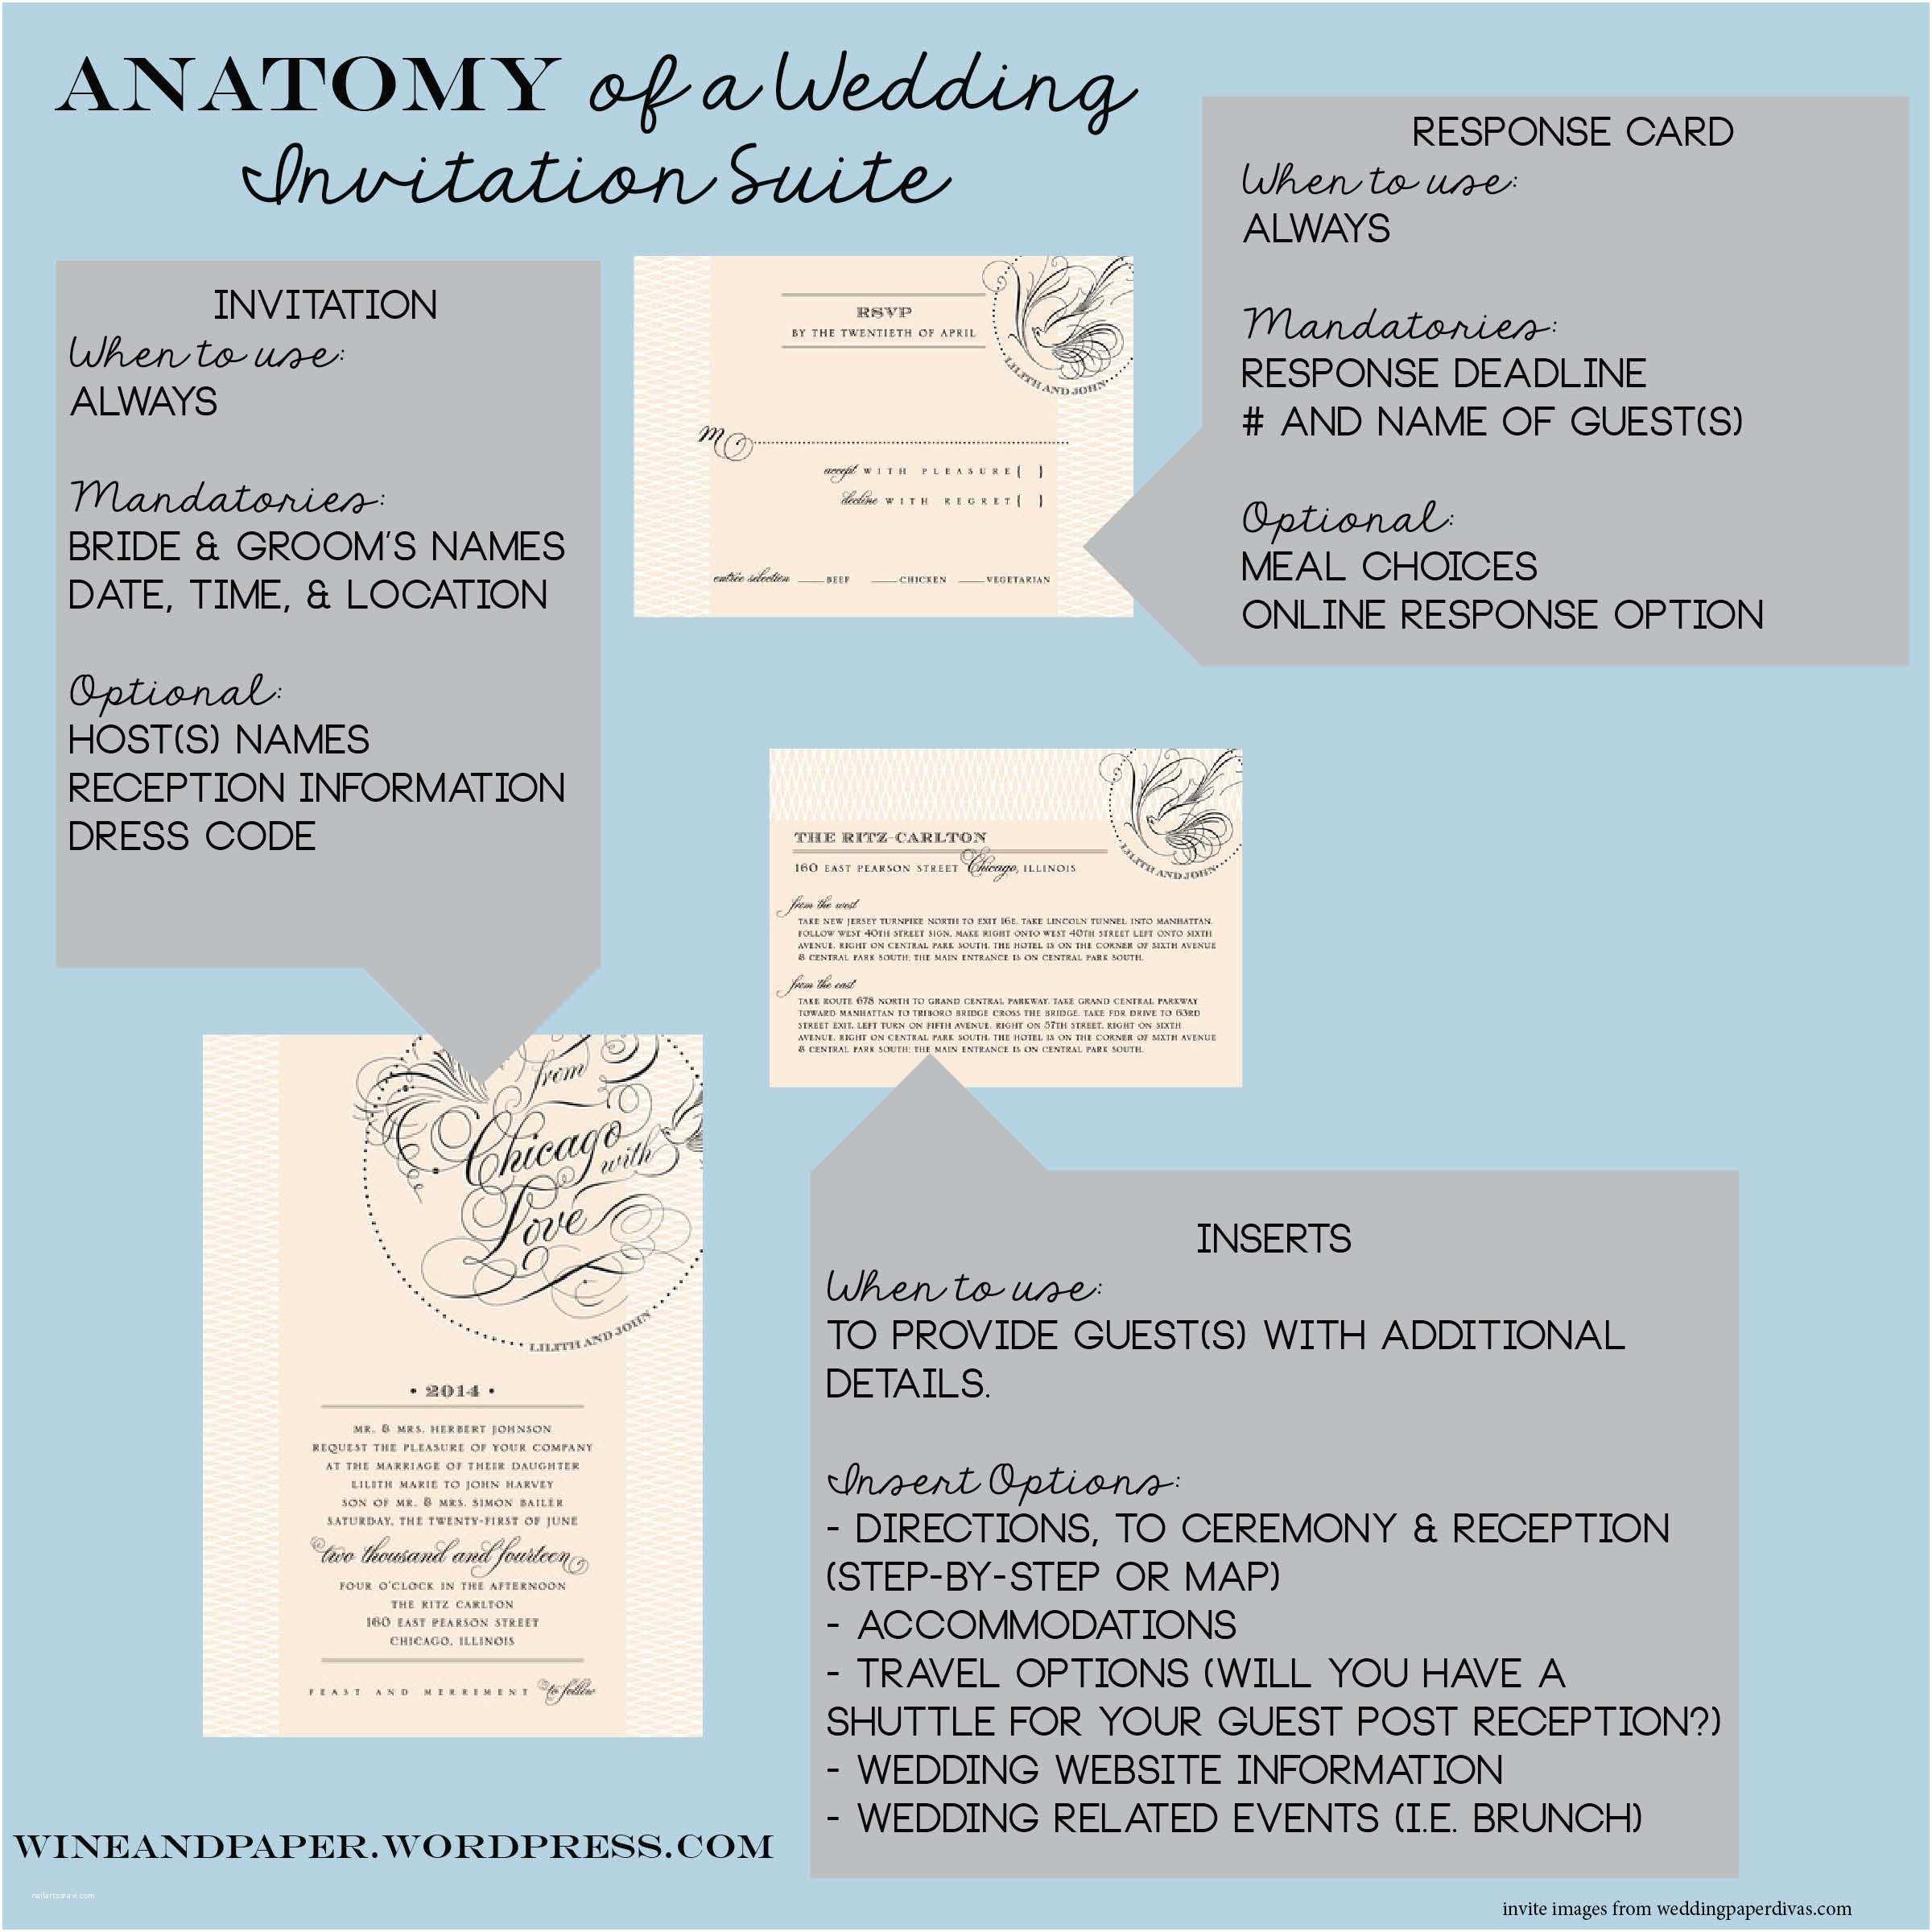 A Wedding Invitation the Anatomy Of A Wedding Invitation Suite